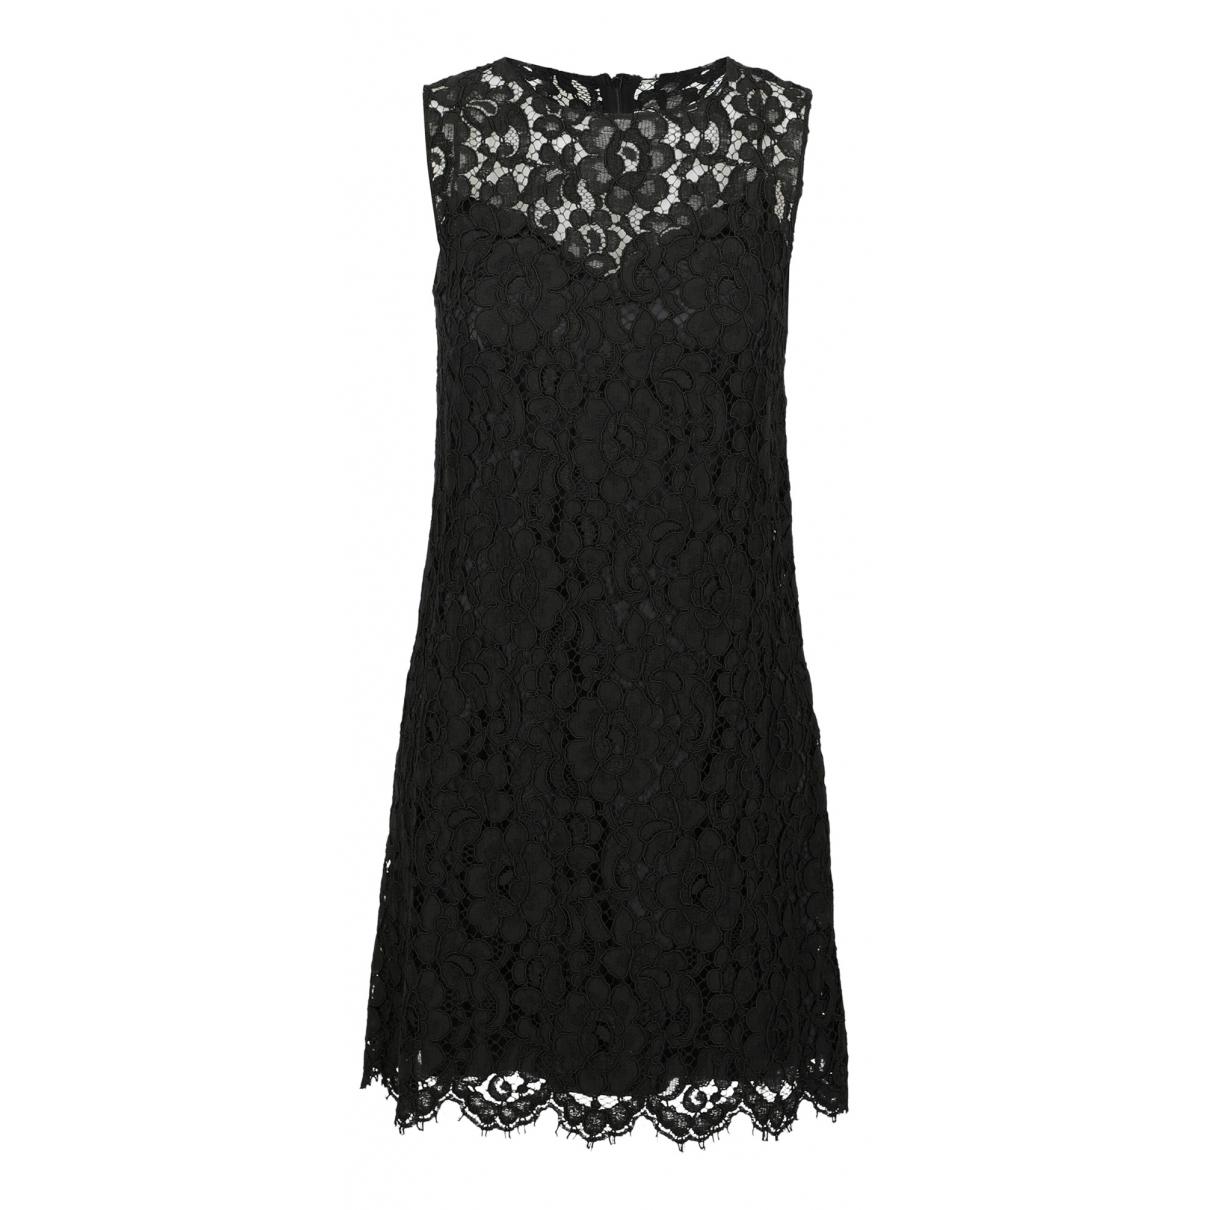 Dolce & Gabbana \N Black Cotton dress for Women 42 IT